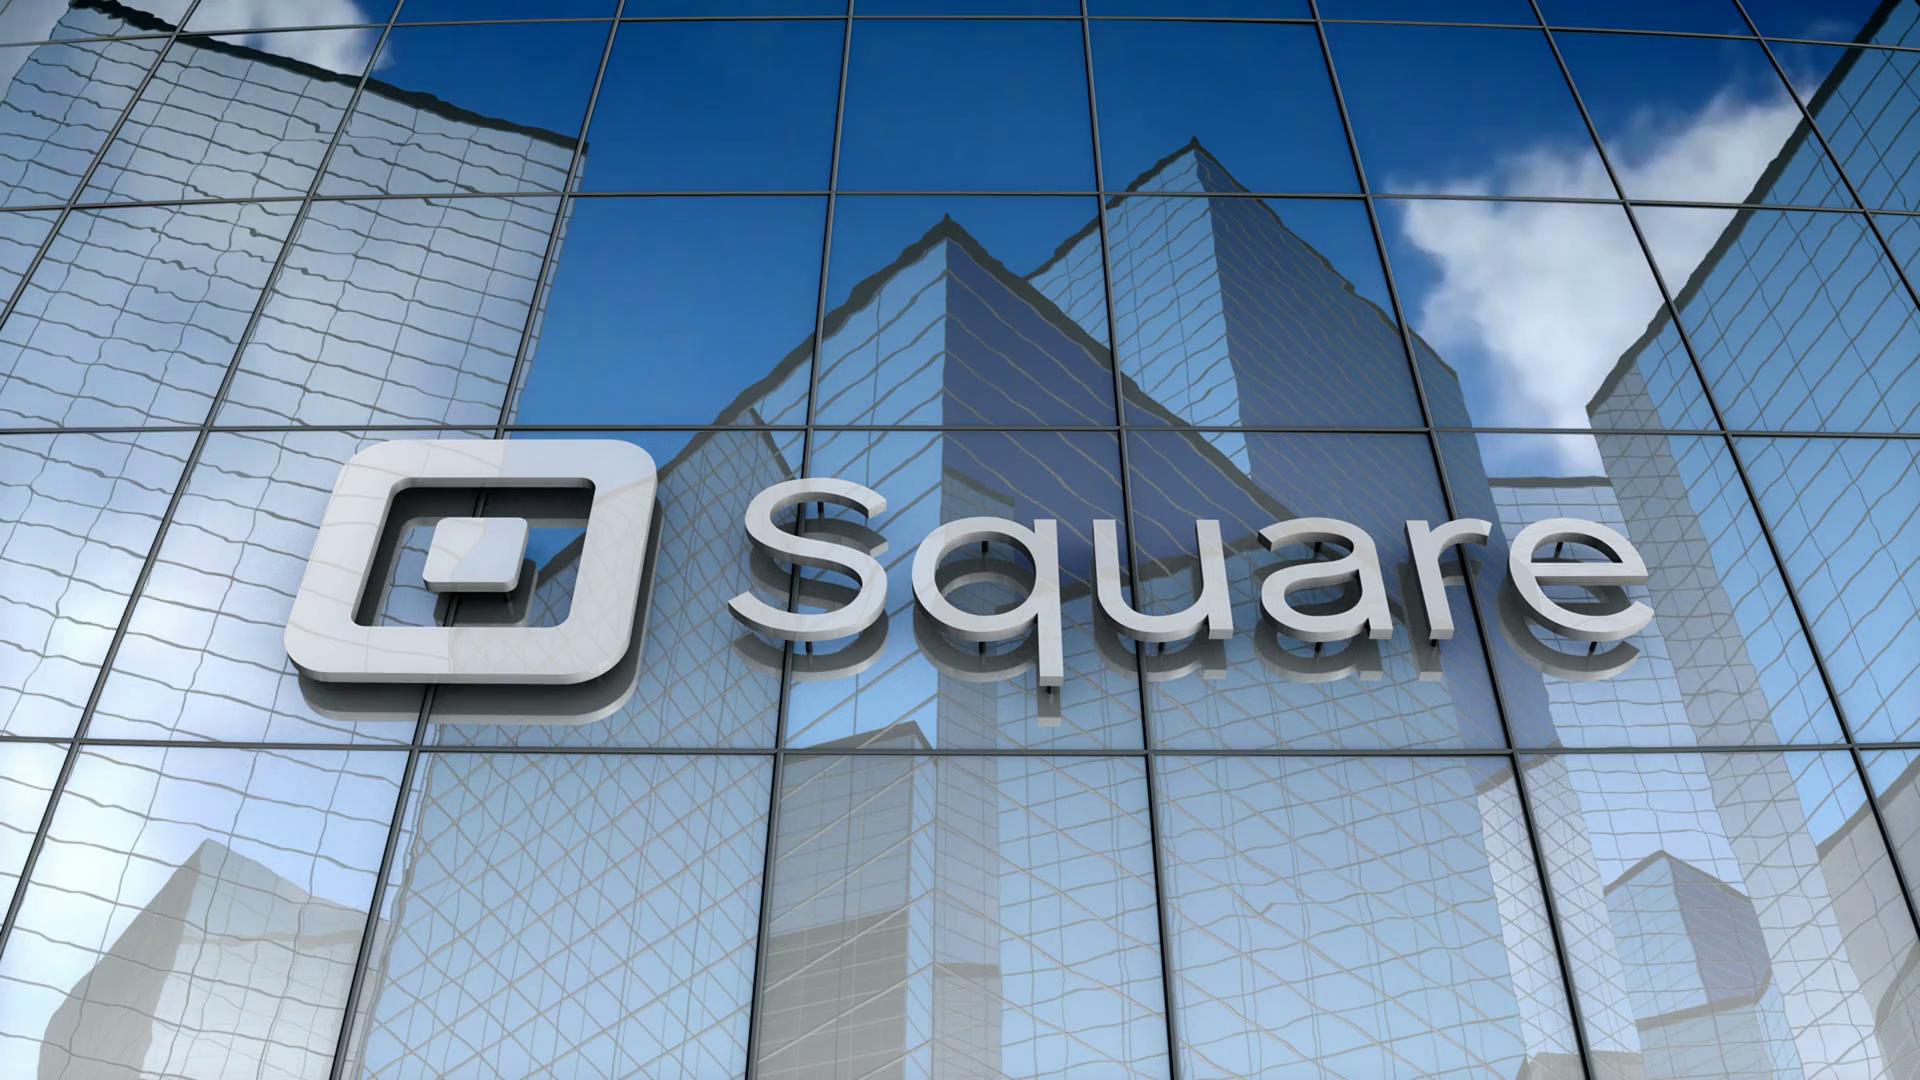 Square ofertará fondos de emergencia a pequeñas empresas afectadas por el Coronavirus